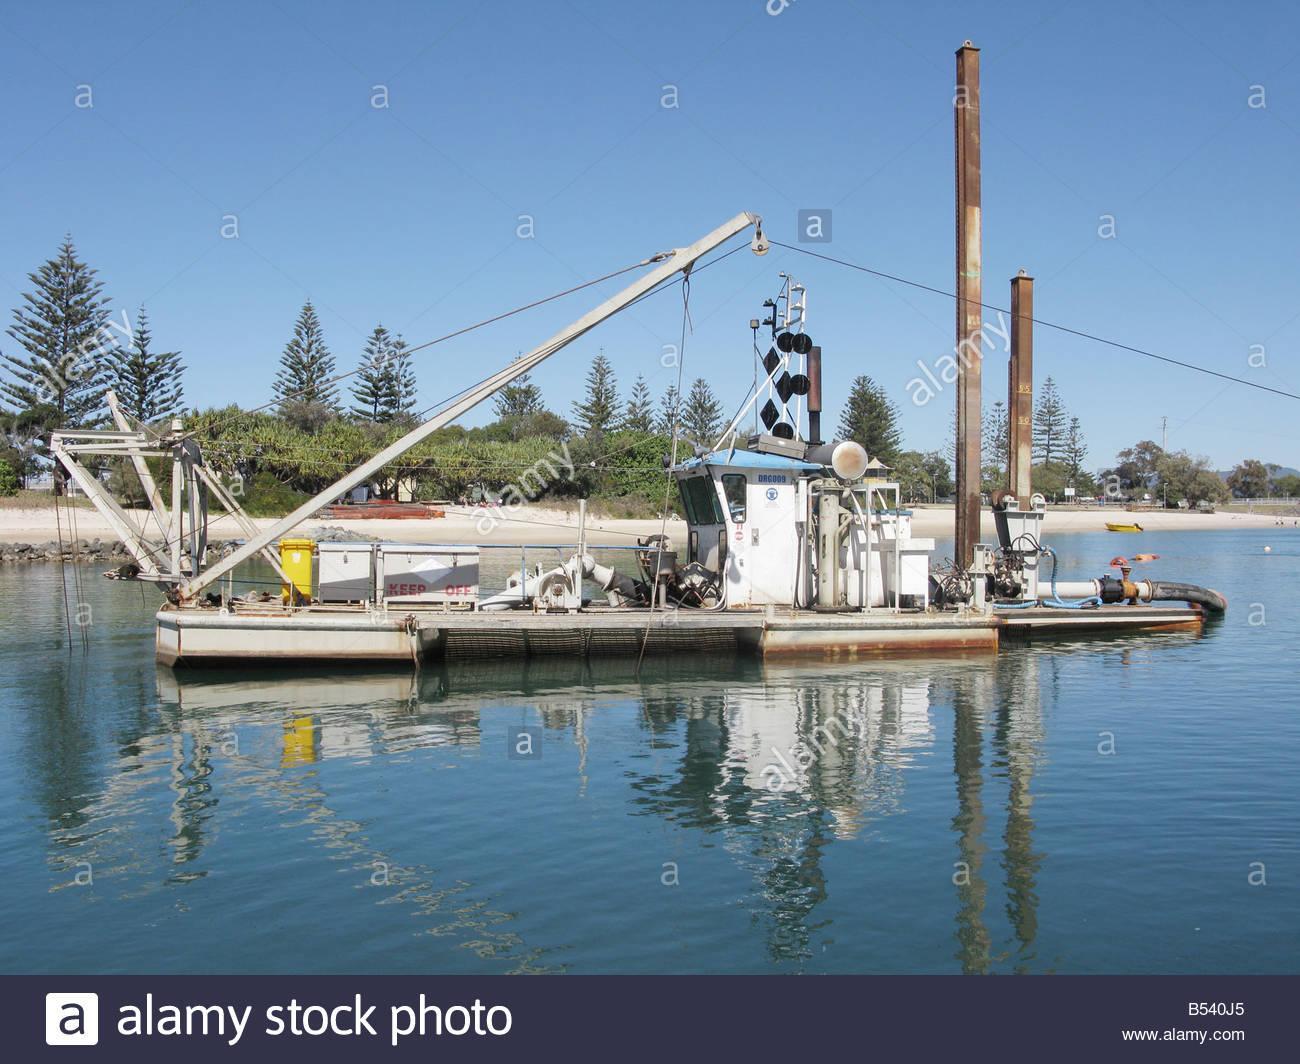 sand-dredging-barge-in-burleigh-heads-gold-coast-queensland-australia-B540J5.jpg